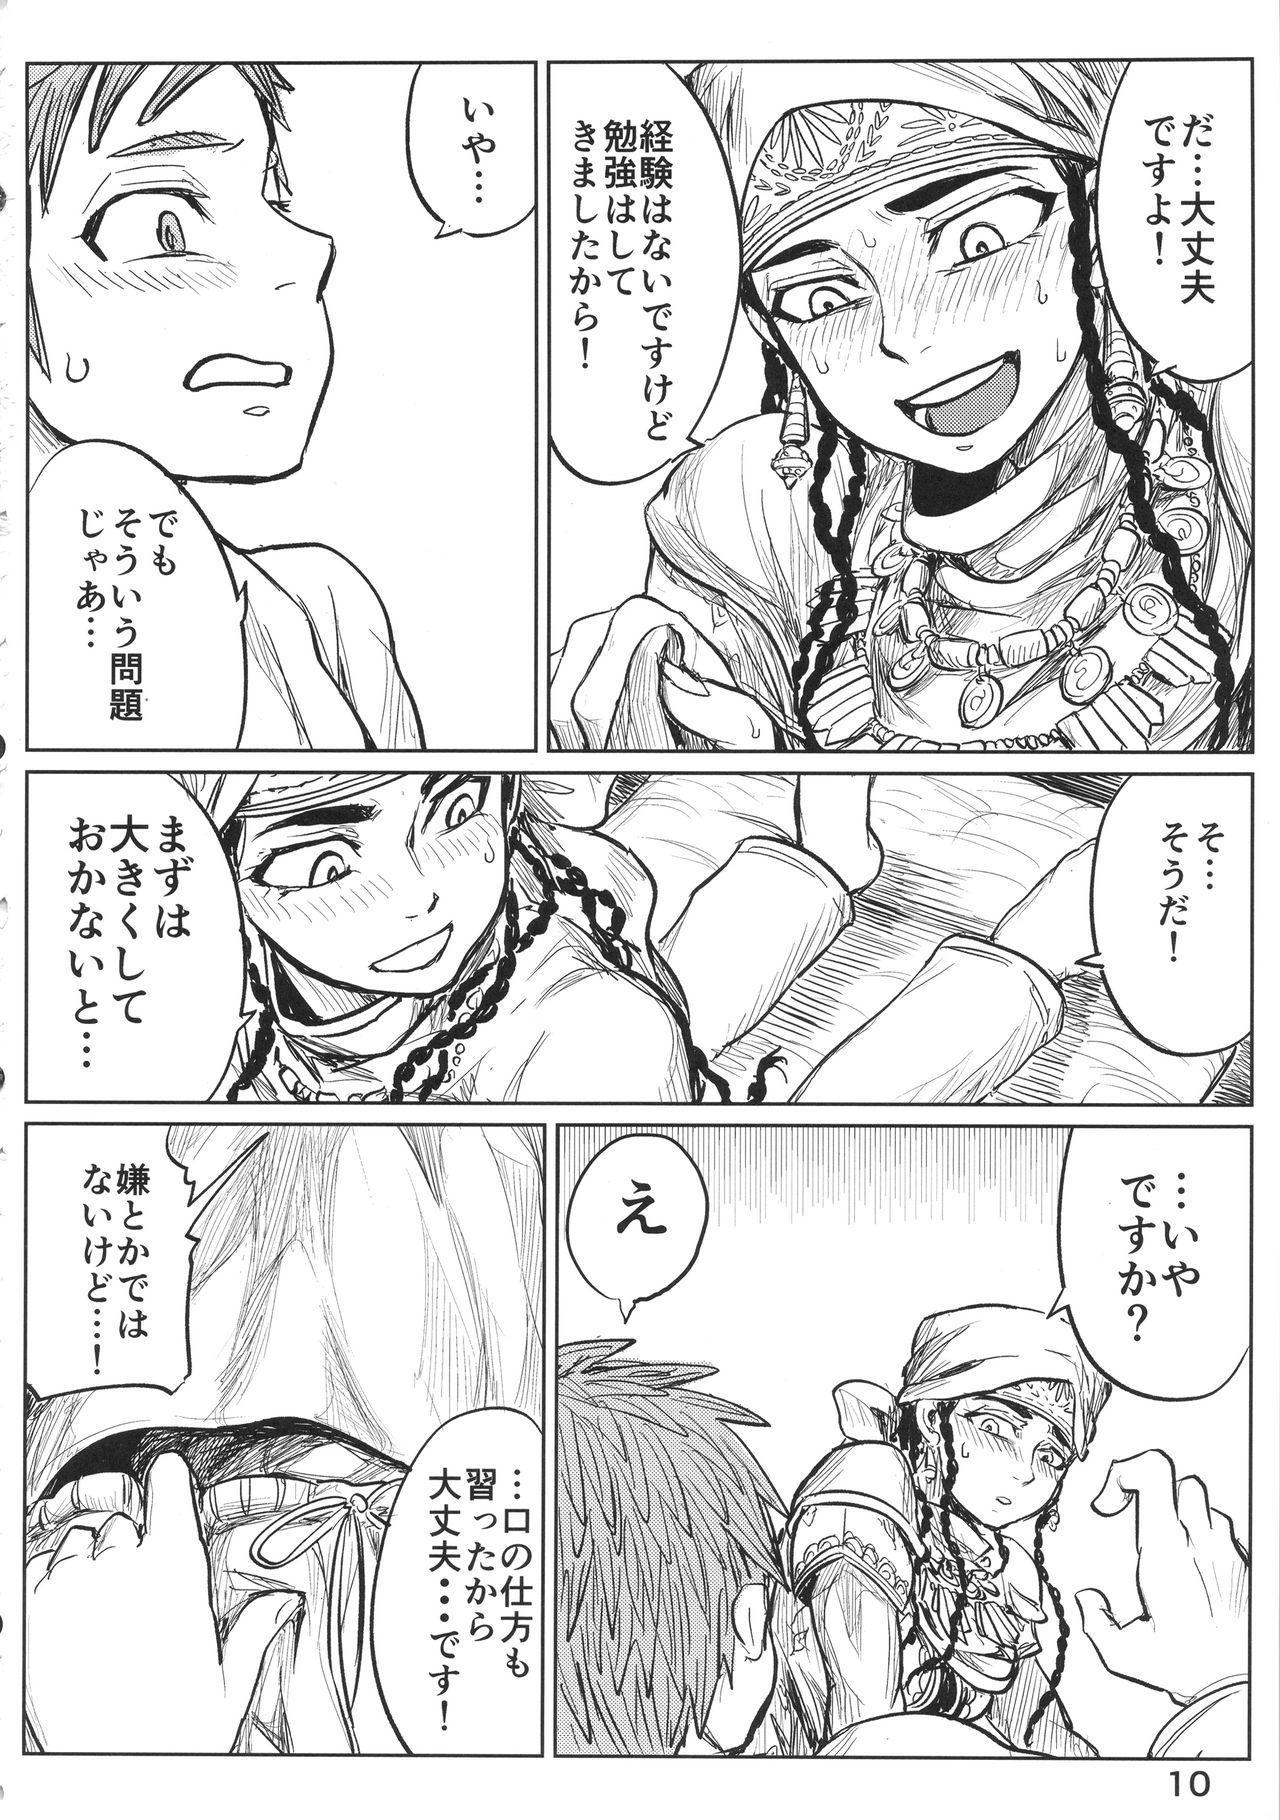 Yomedameshi 8